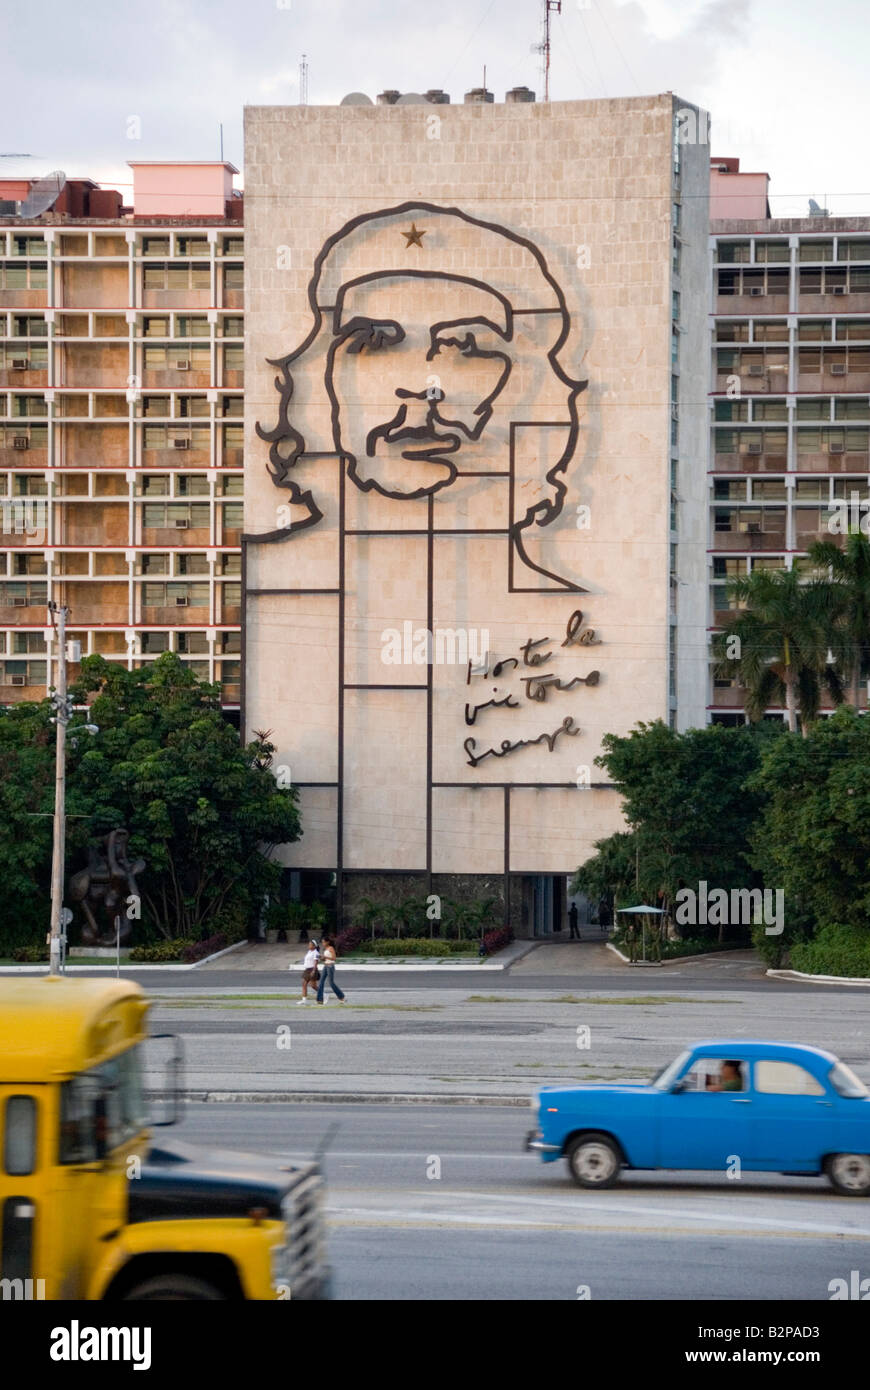 Ernesto Che Guevara Stahl Skulptur auf dem Innenministerium Gebäude Plaza De La Revolucion in Vedado Havanna Stockbild